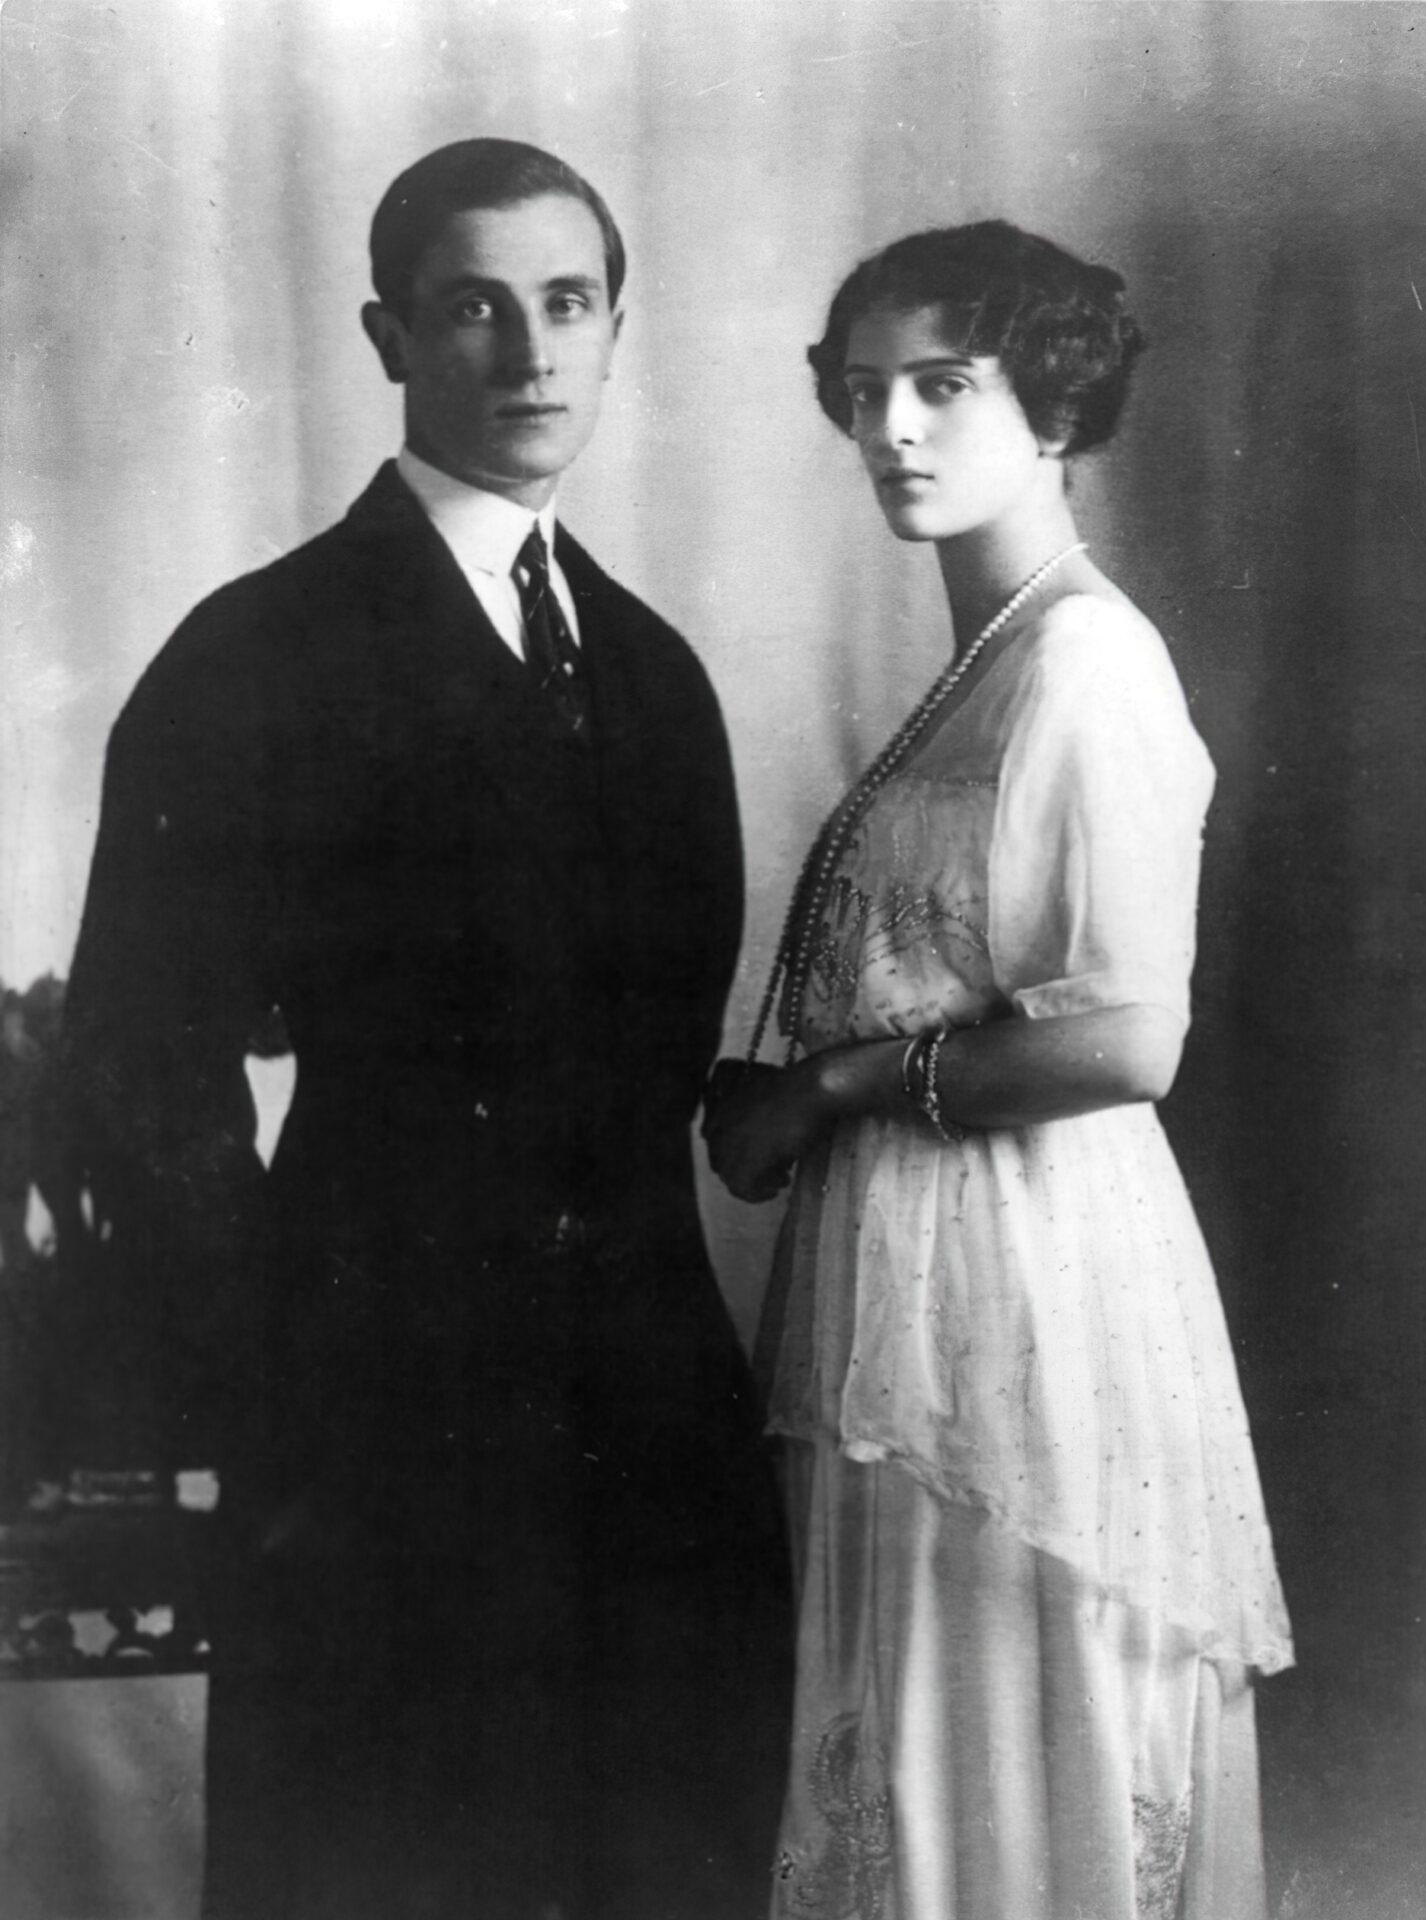 Jusupow z żoną